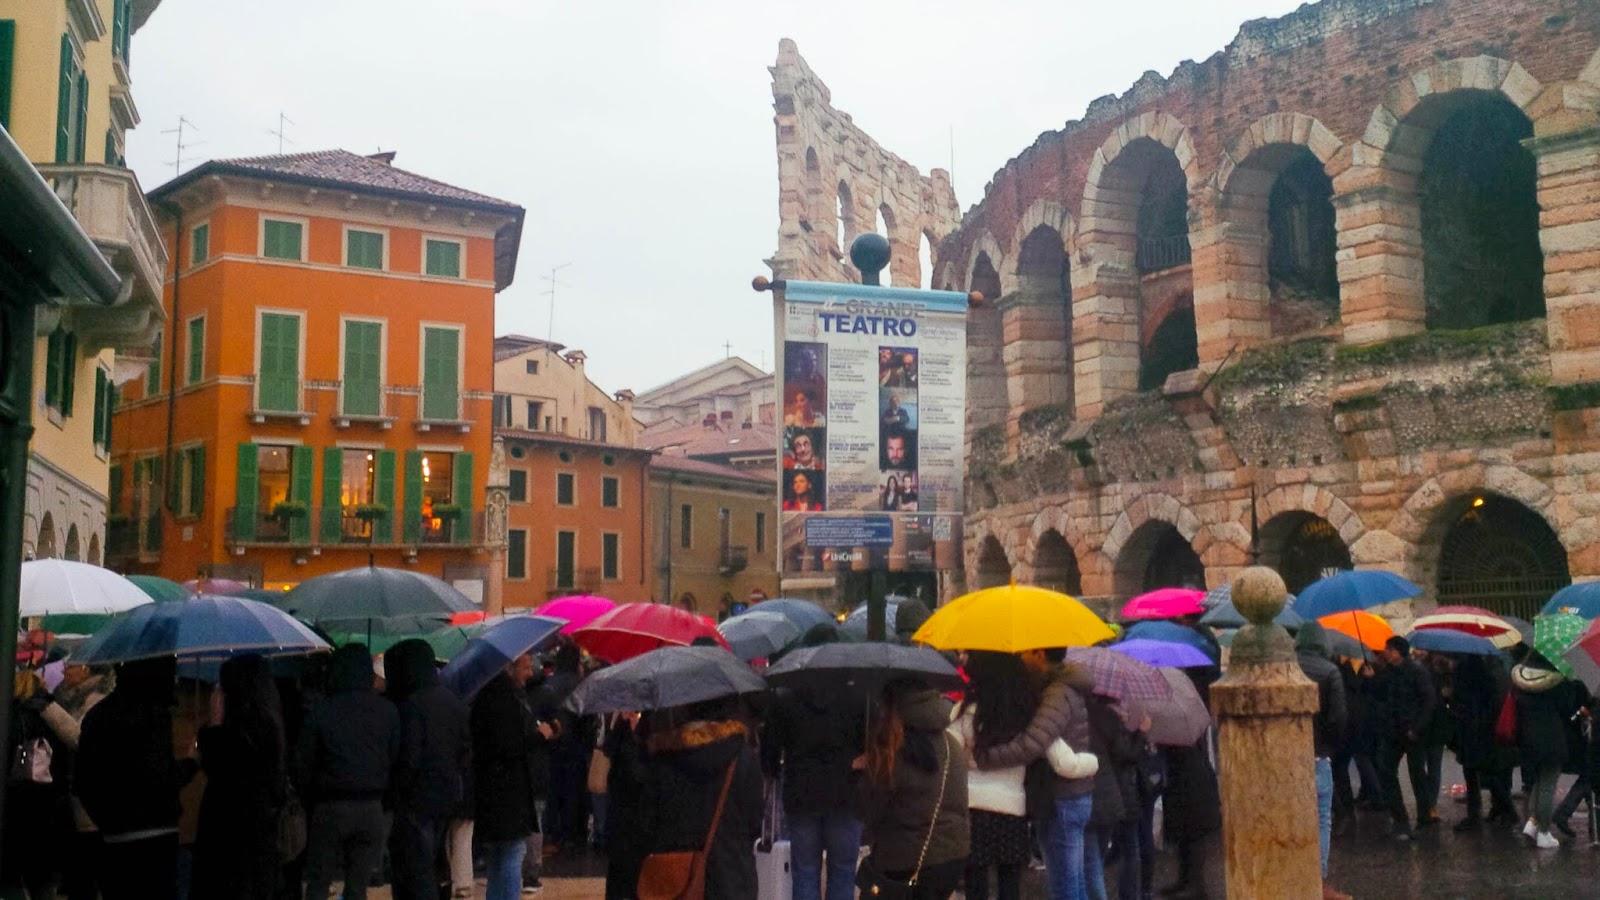 rain Verona St. Valentine's Day 2015